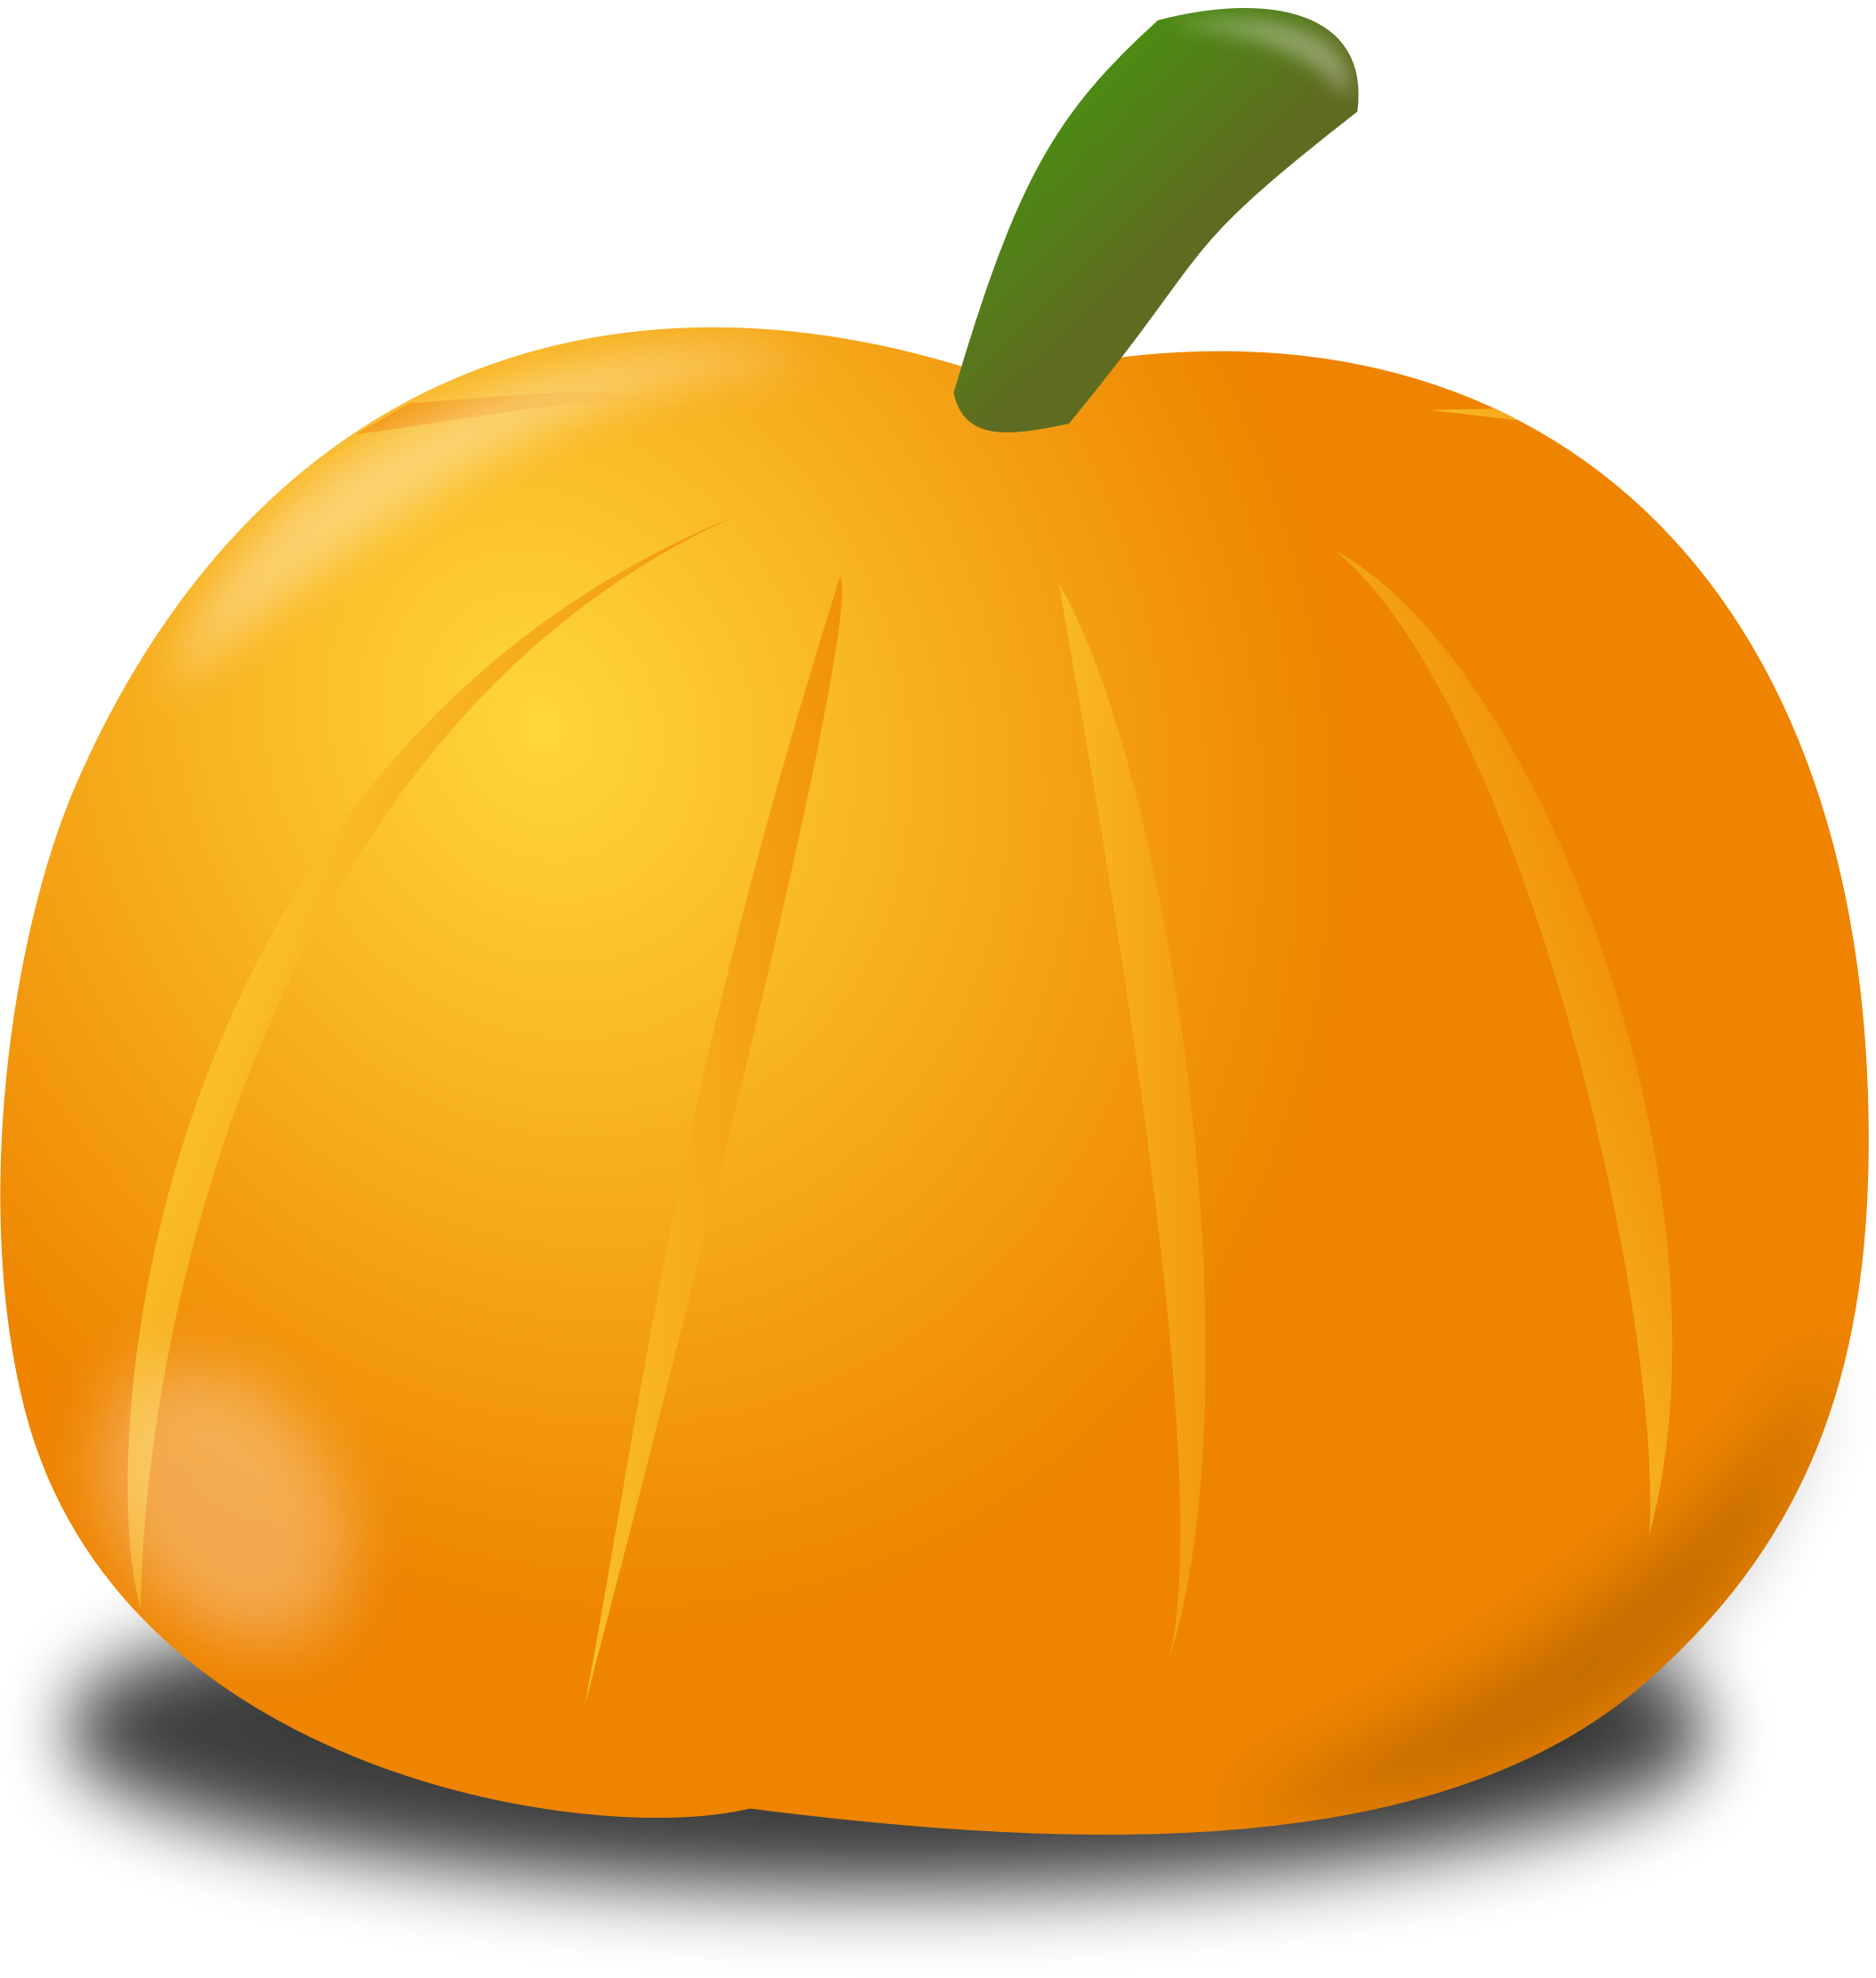 Clipart food pumpkin. Base big image png